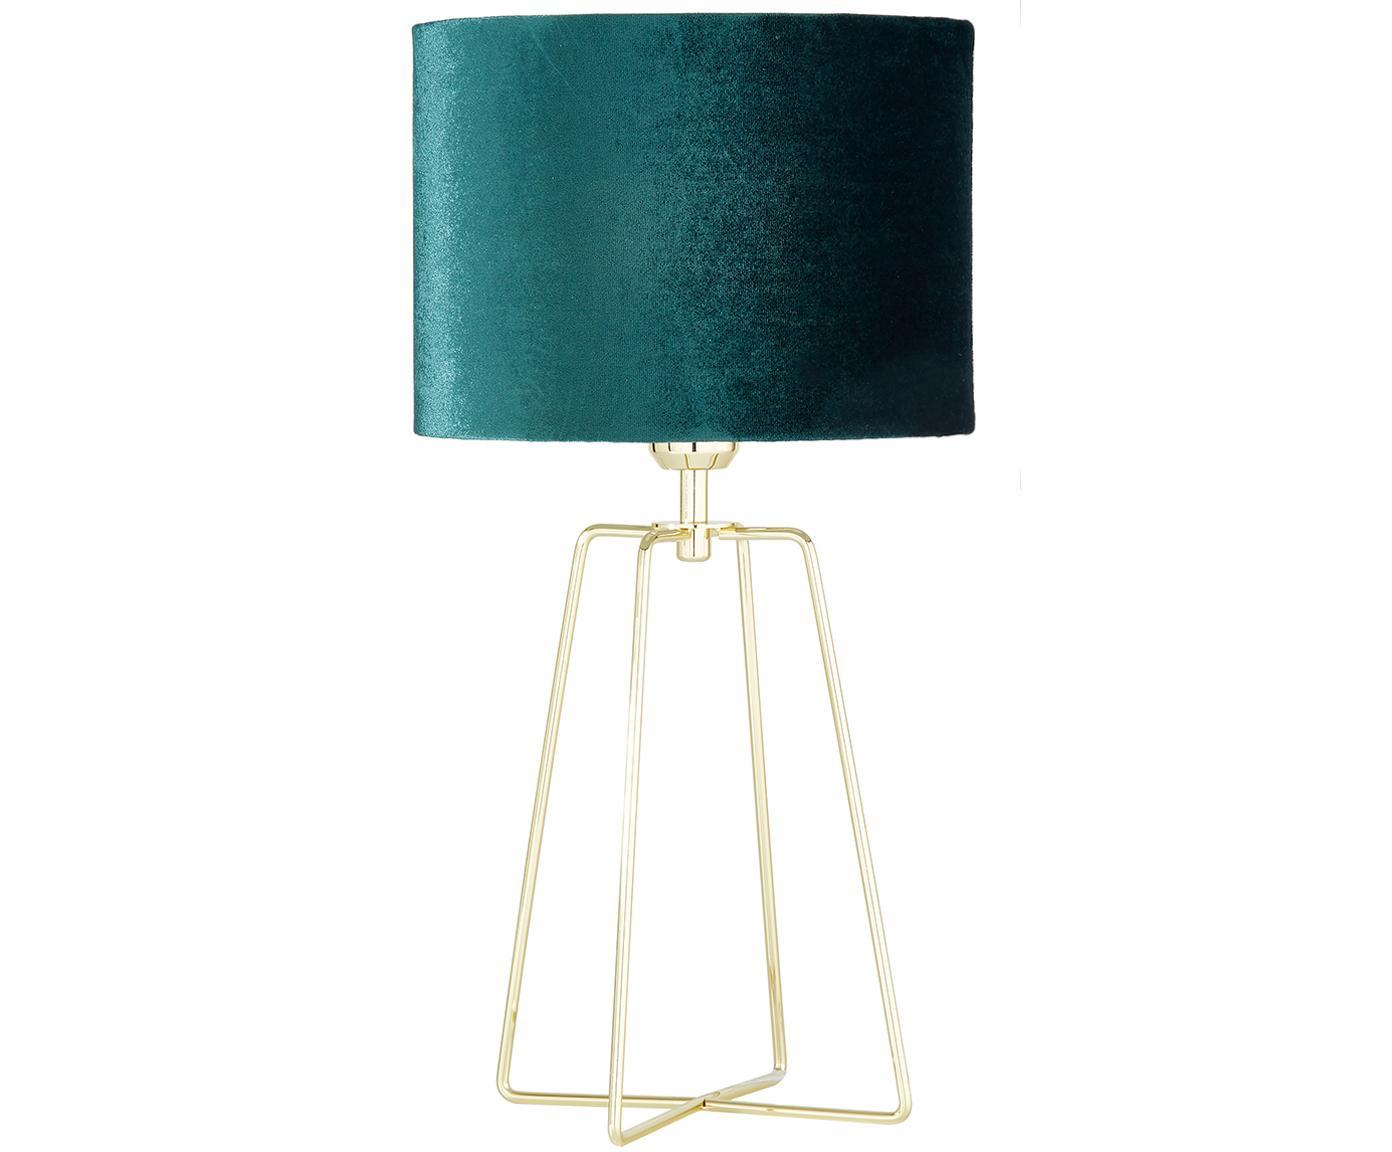 Tafellamp Karolina, Lampenkap: fluweel, Lampvoet: vermessingd metaal, Lampenkap: donkergroen lampvoet: messing, glanzend Snoer: transparant, Ø 25 x H 49 cm